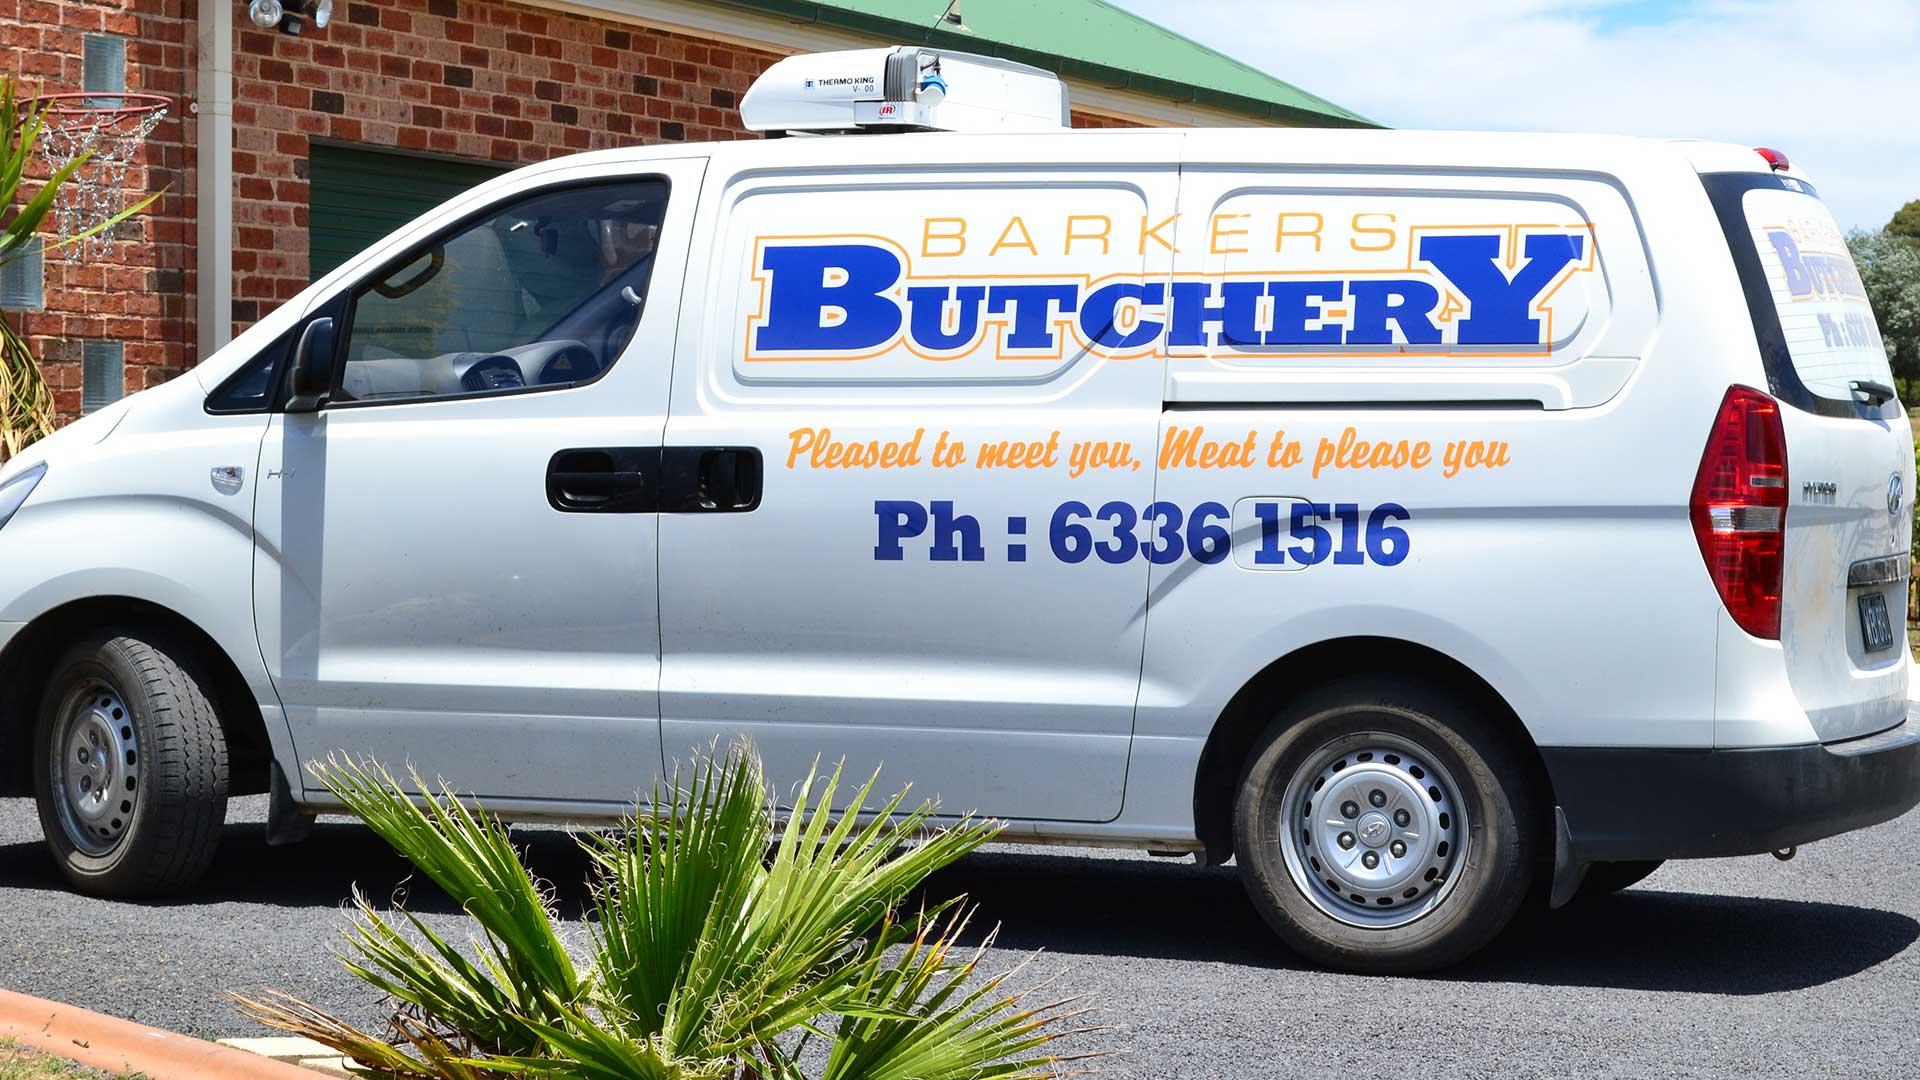 Business - Barker's Butchery | Visit Oberon